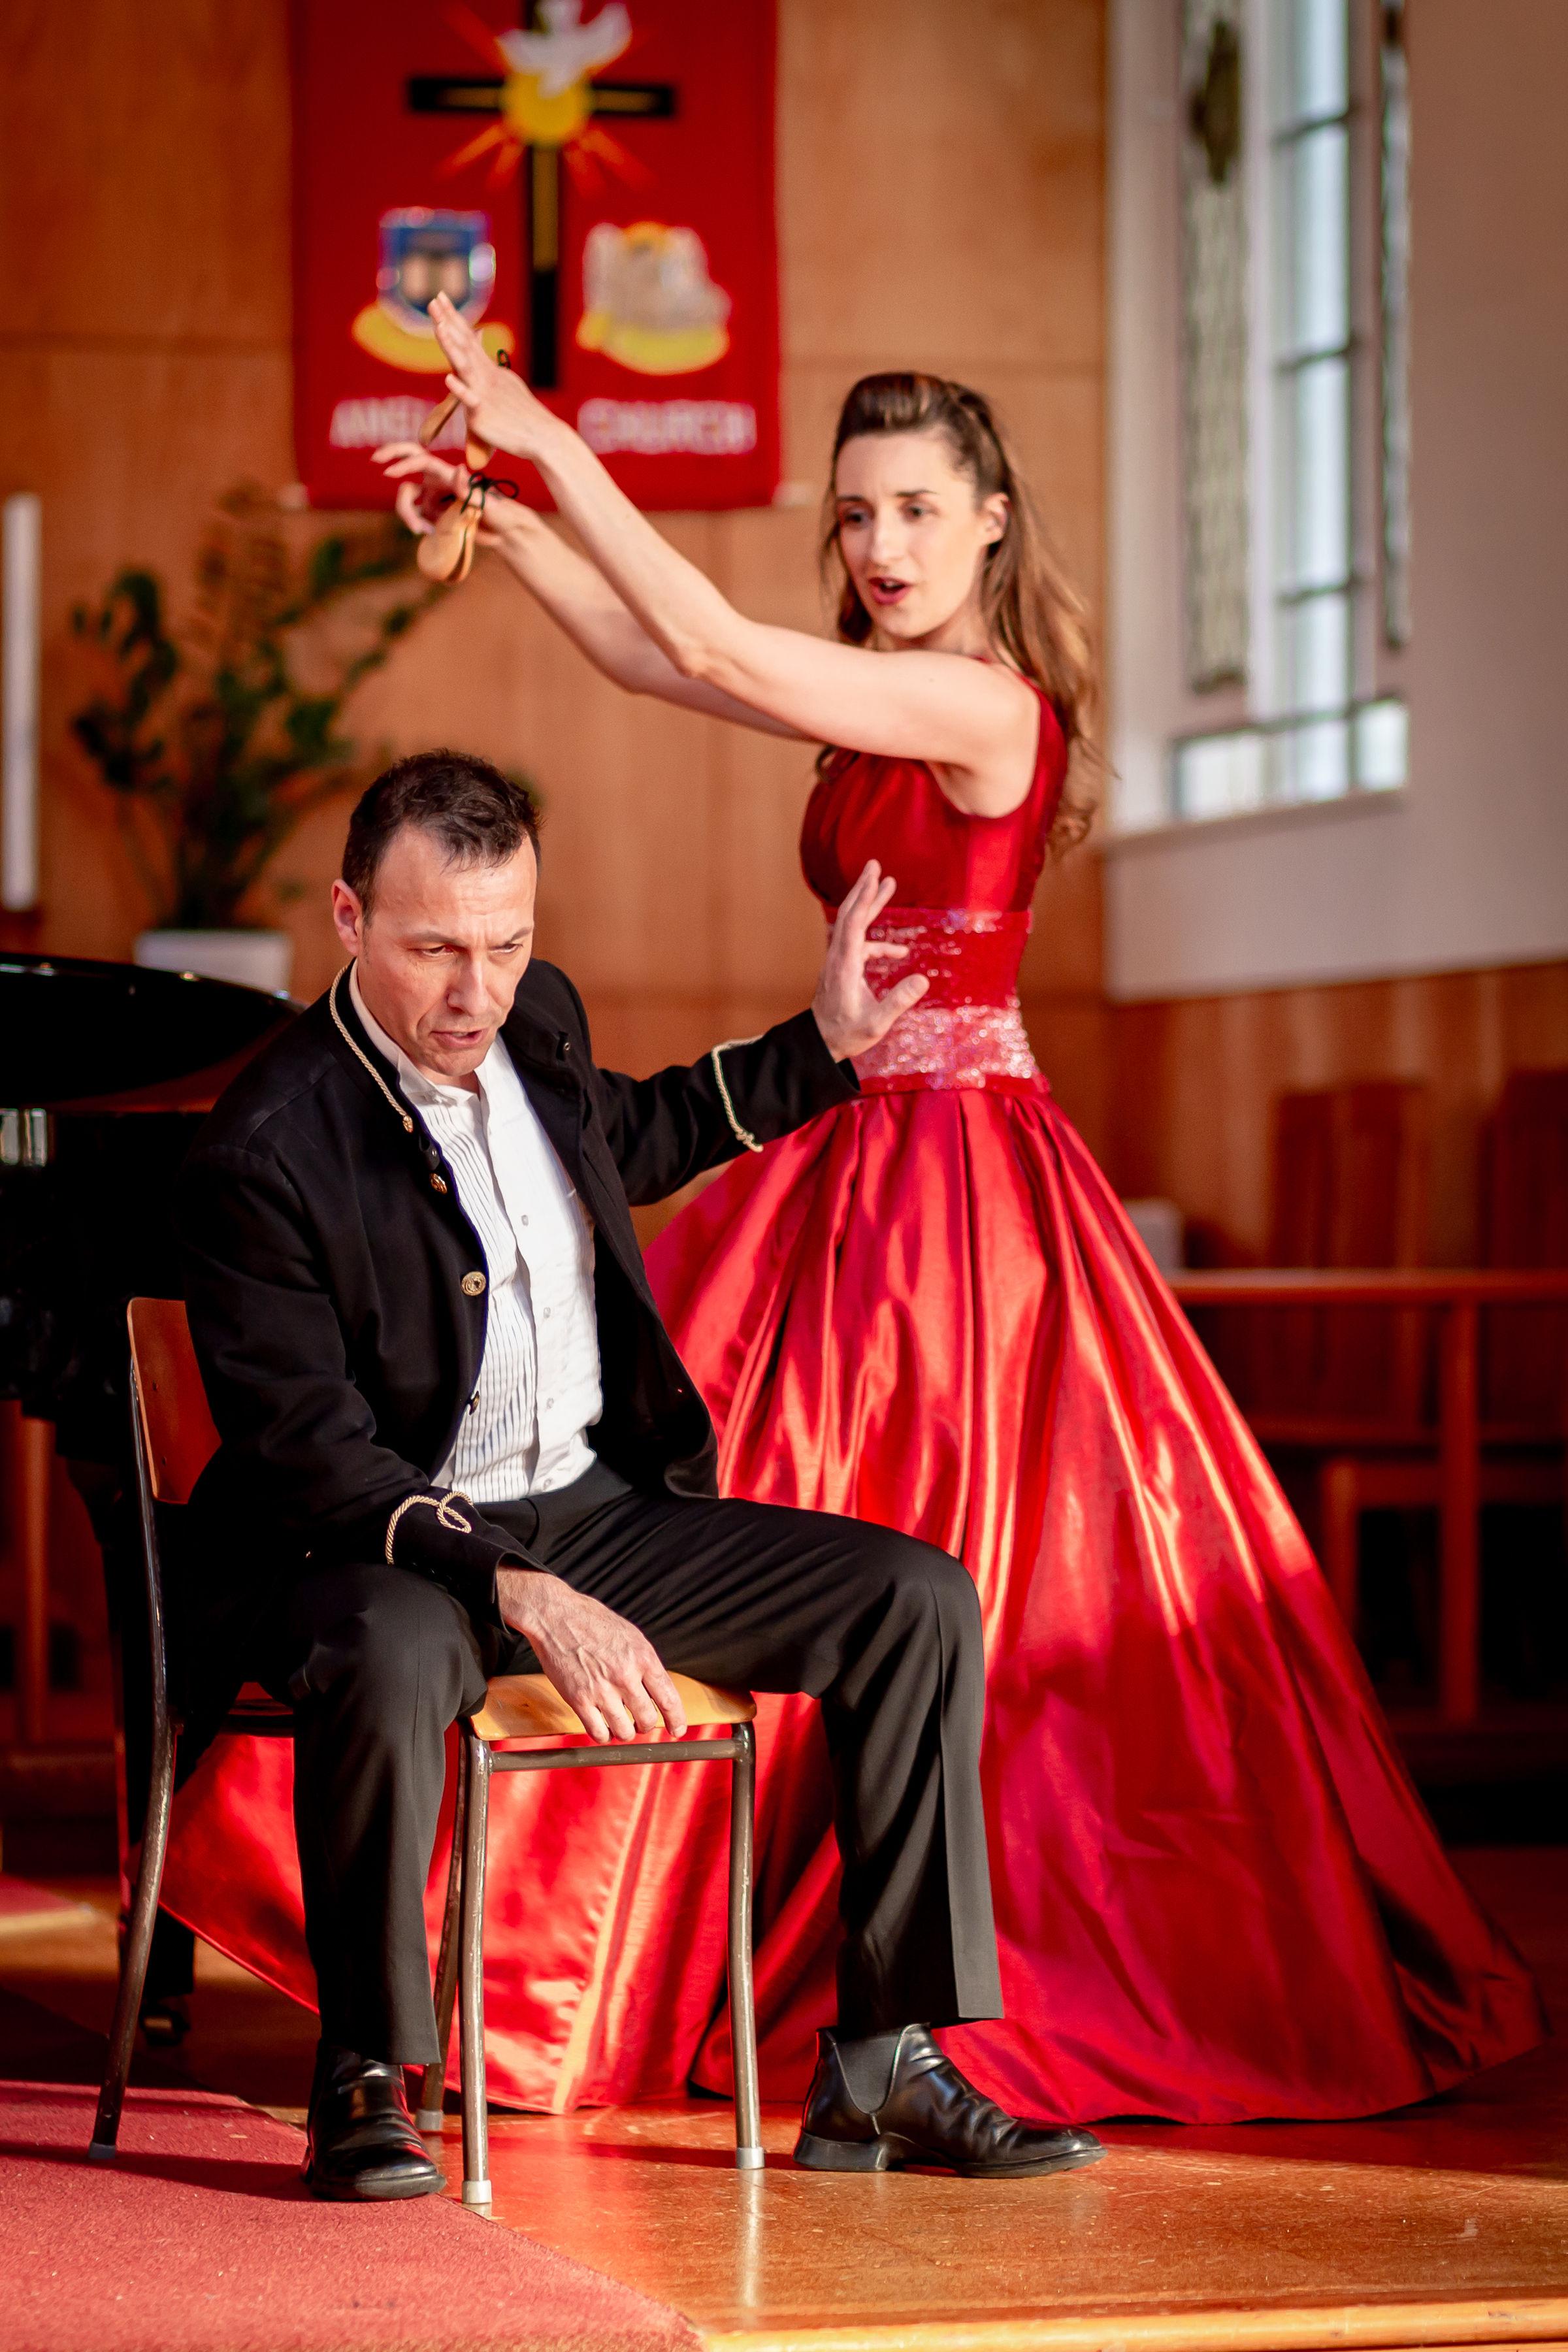 Carlos & Olesia in 'Roses & Daggers'